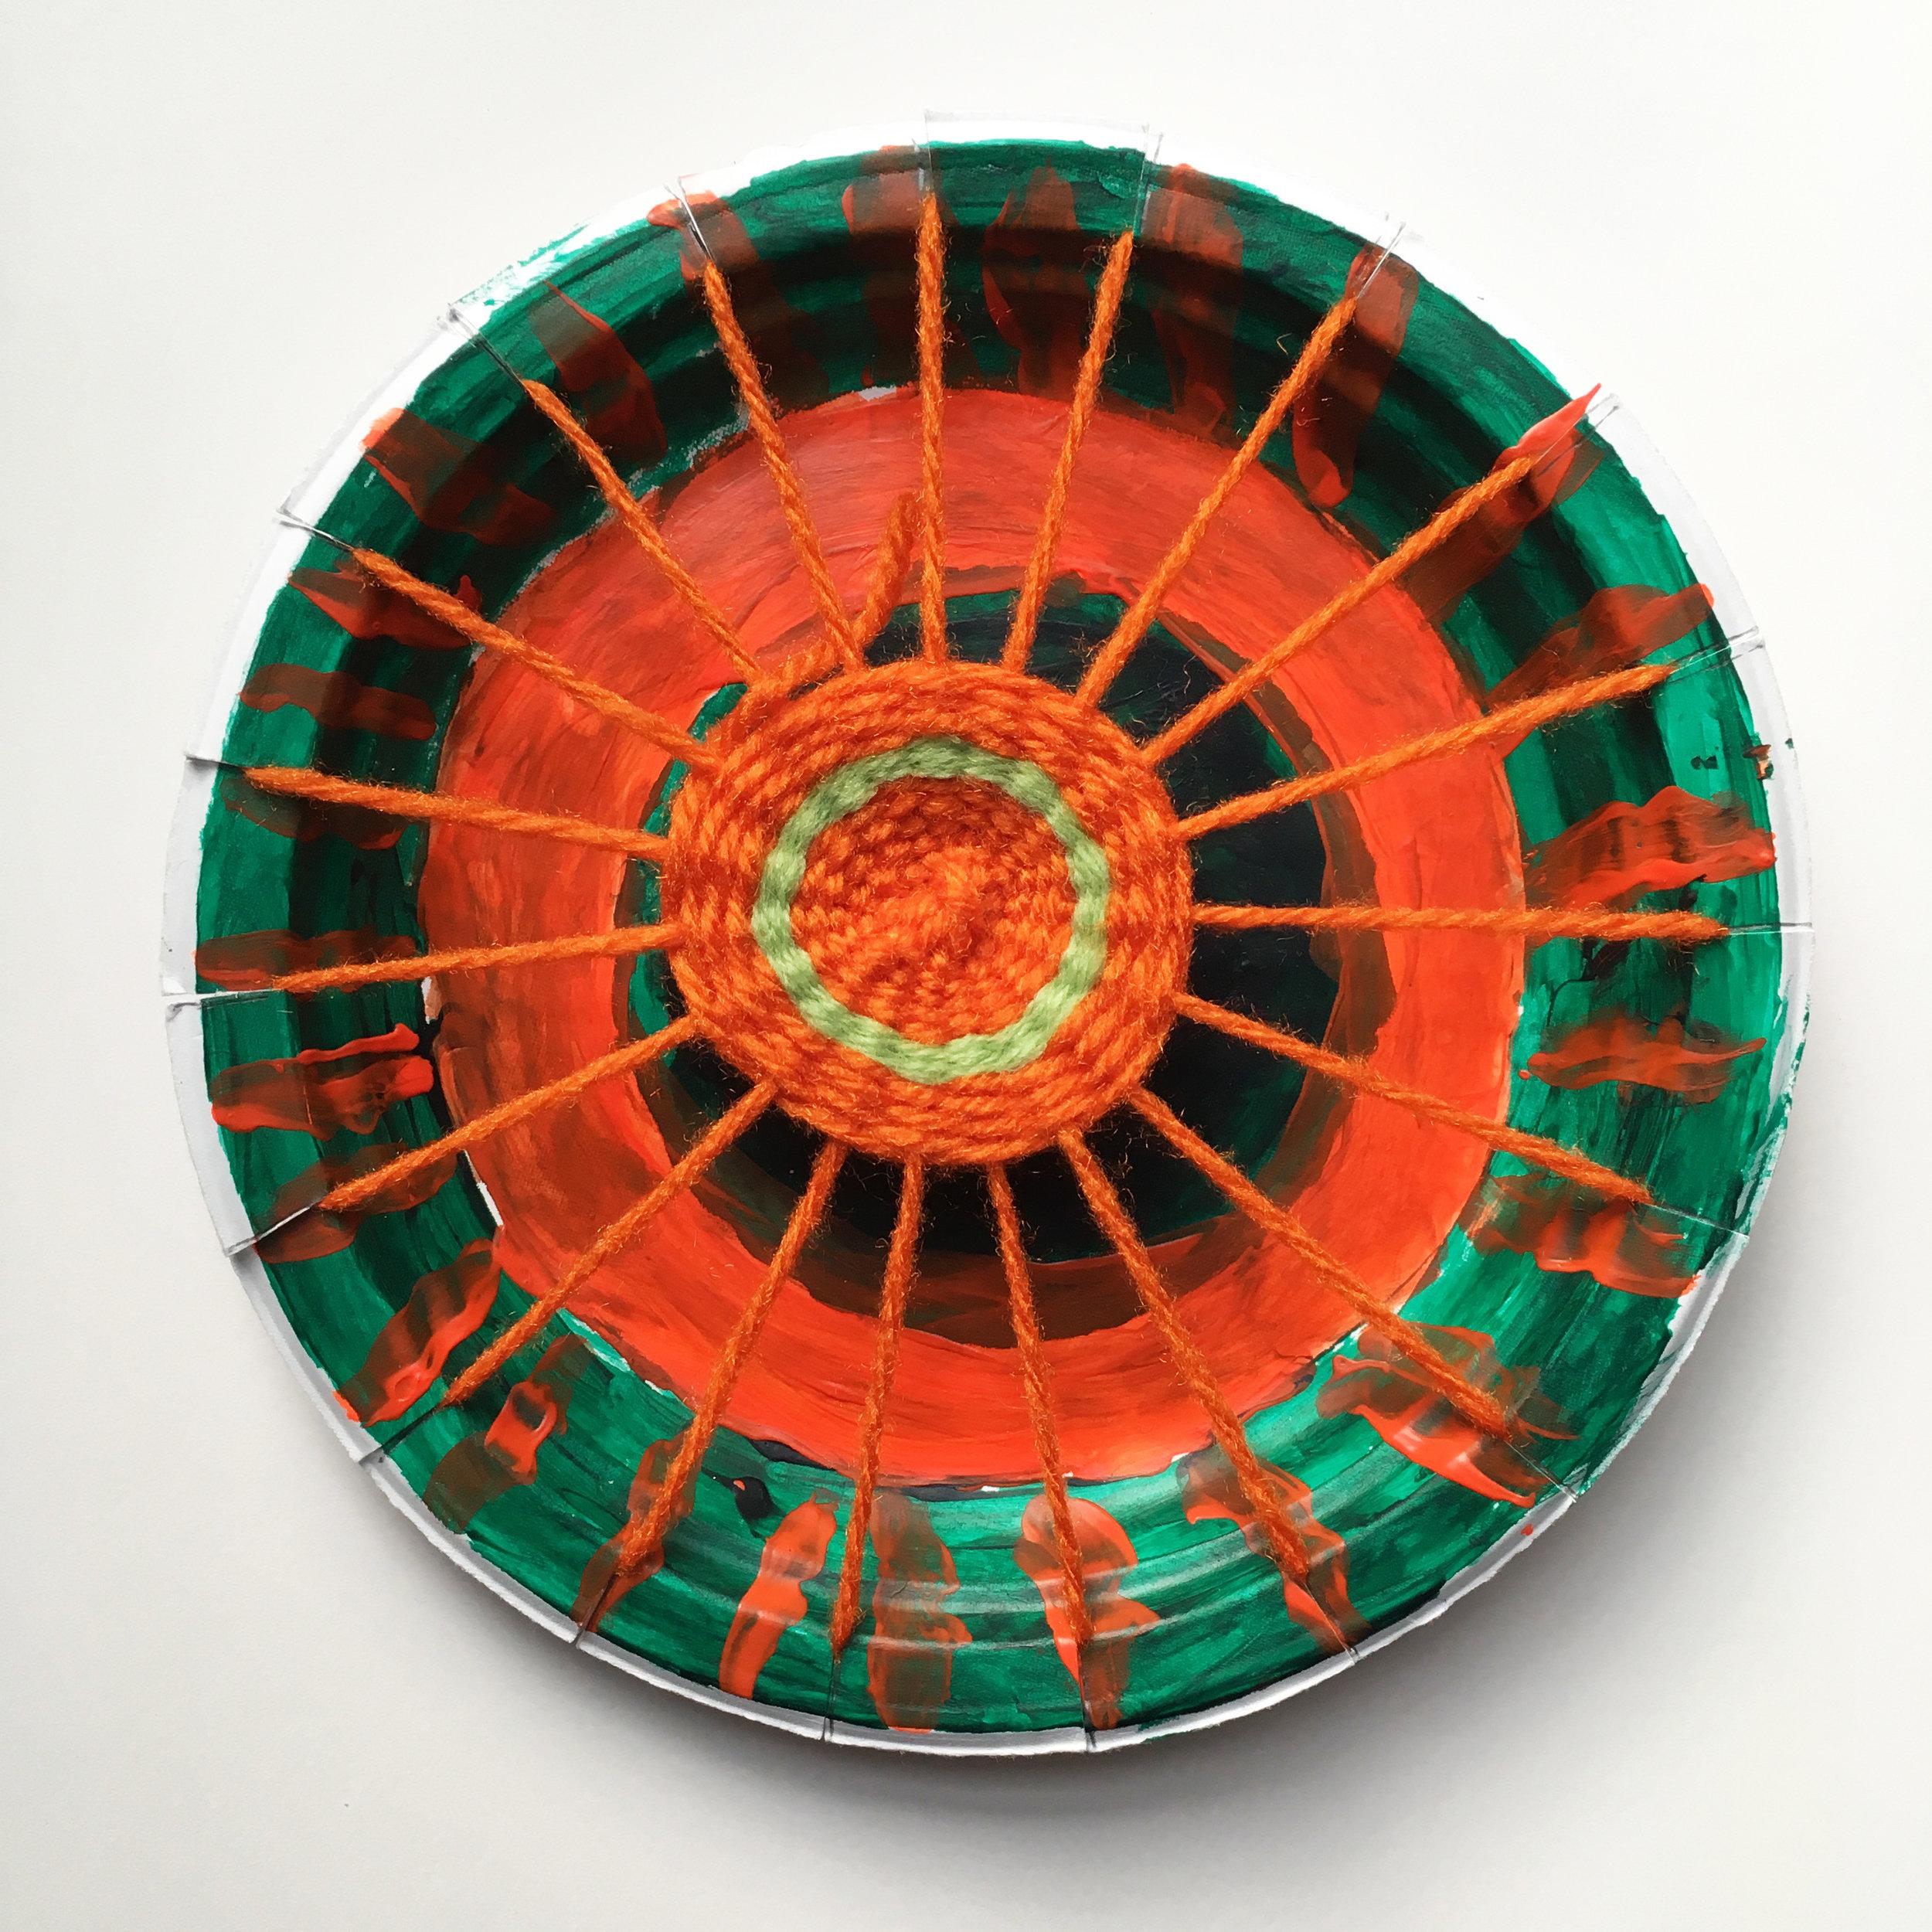 Daniel_circular weaving_01.jpg